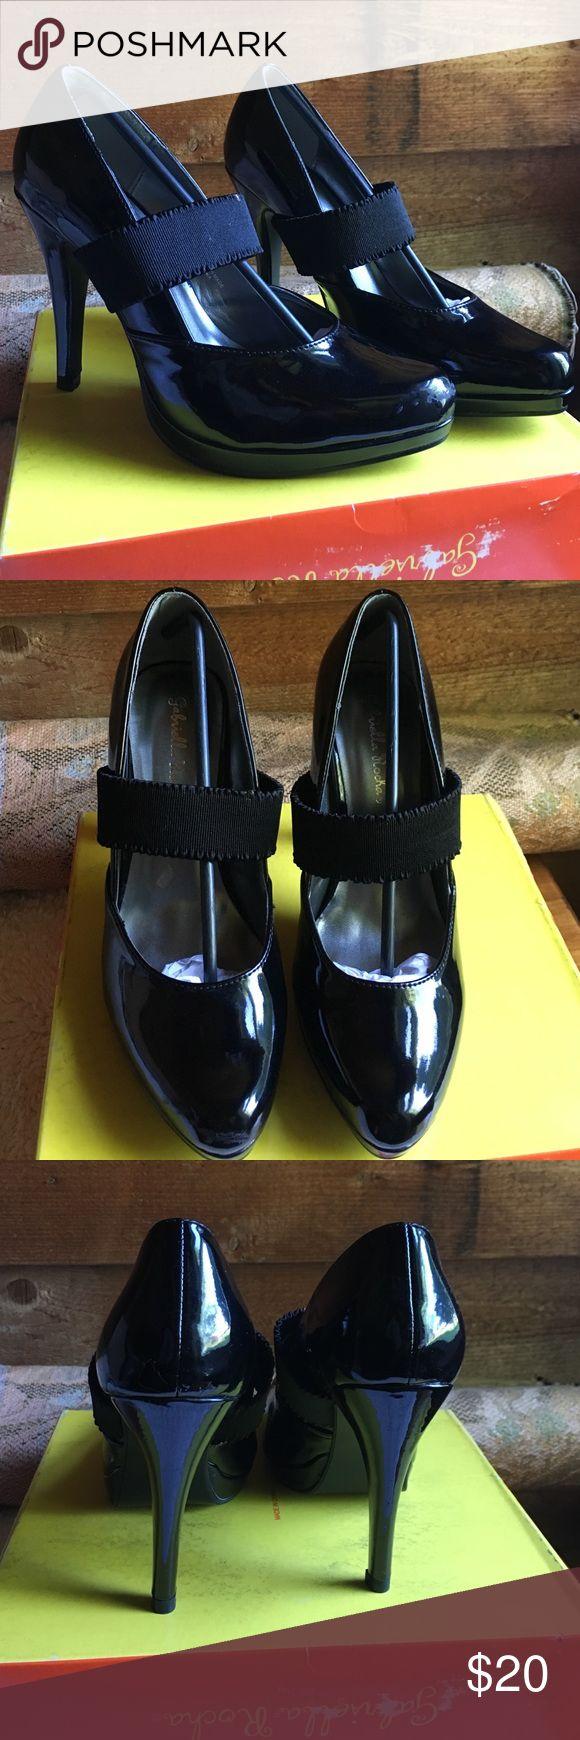 Gabriella Rocha black patent shoes Gabriella Rocha black patent heels . 4 1/2 heel height. These are B-medium. Vanani. Firm on price Gabriella Rocha  Shoes Heels